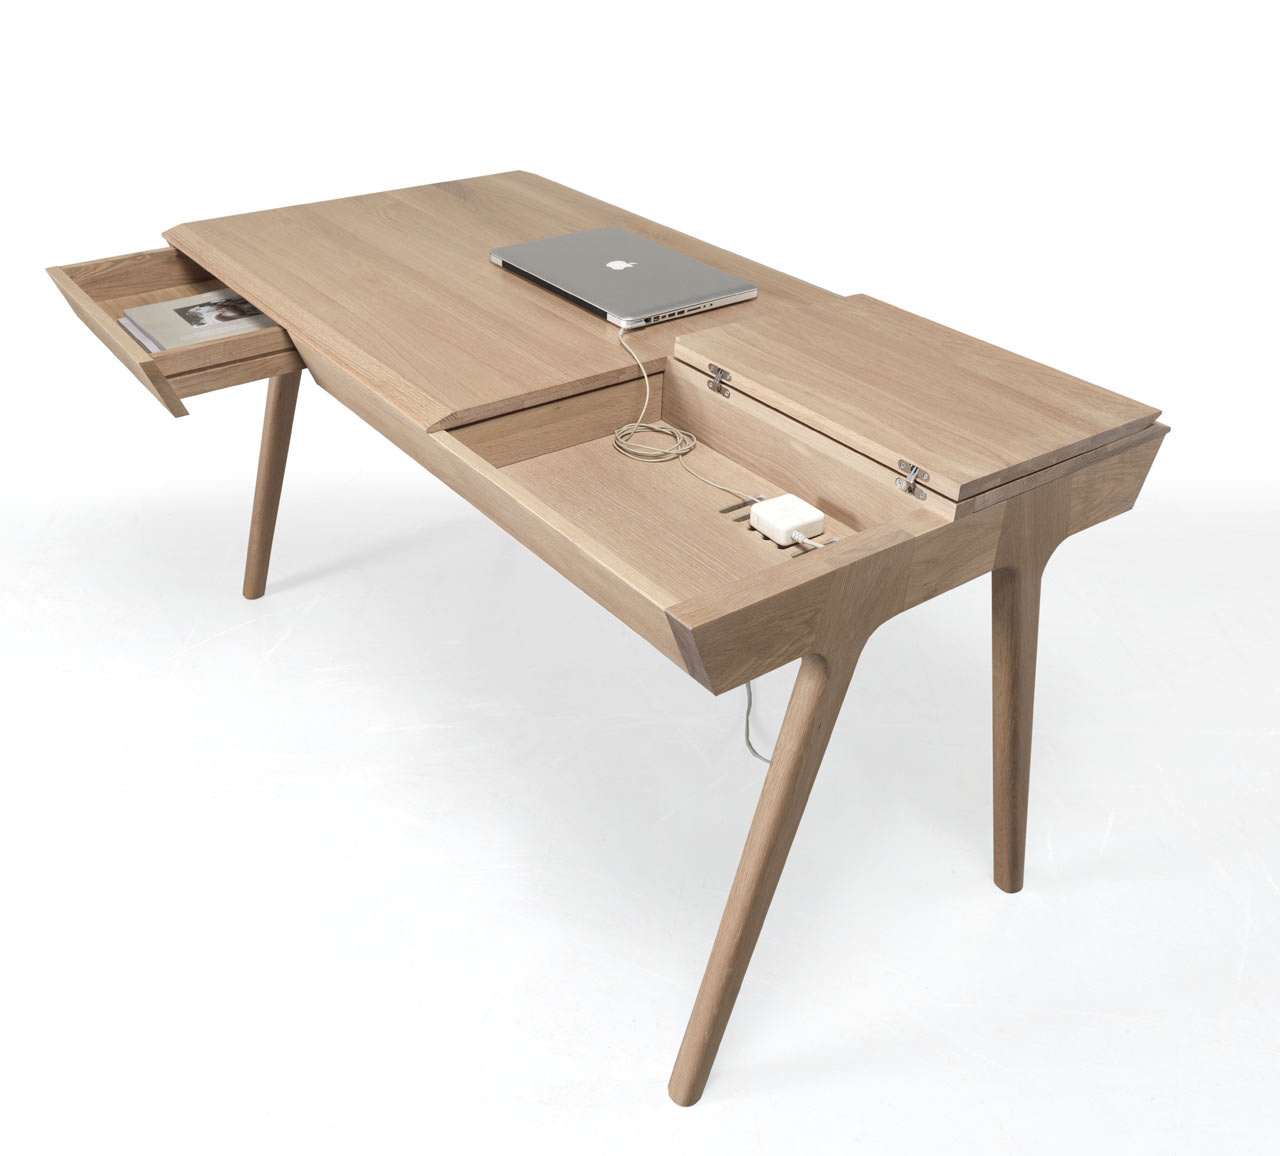 METIS A Solid Wood Desk with Plenty of Storage  Design Milk